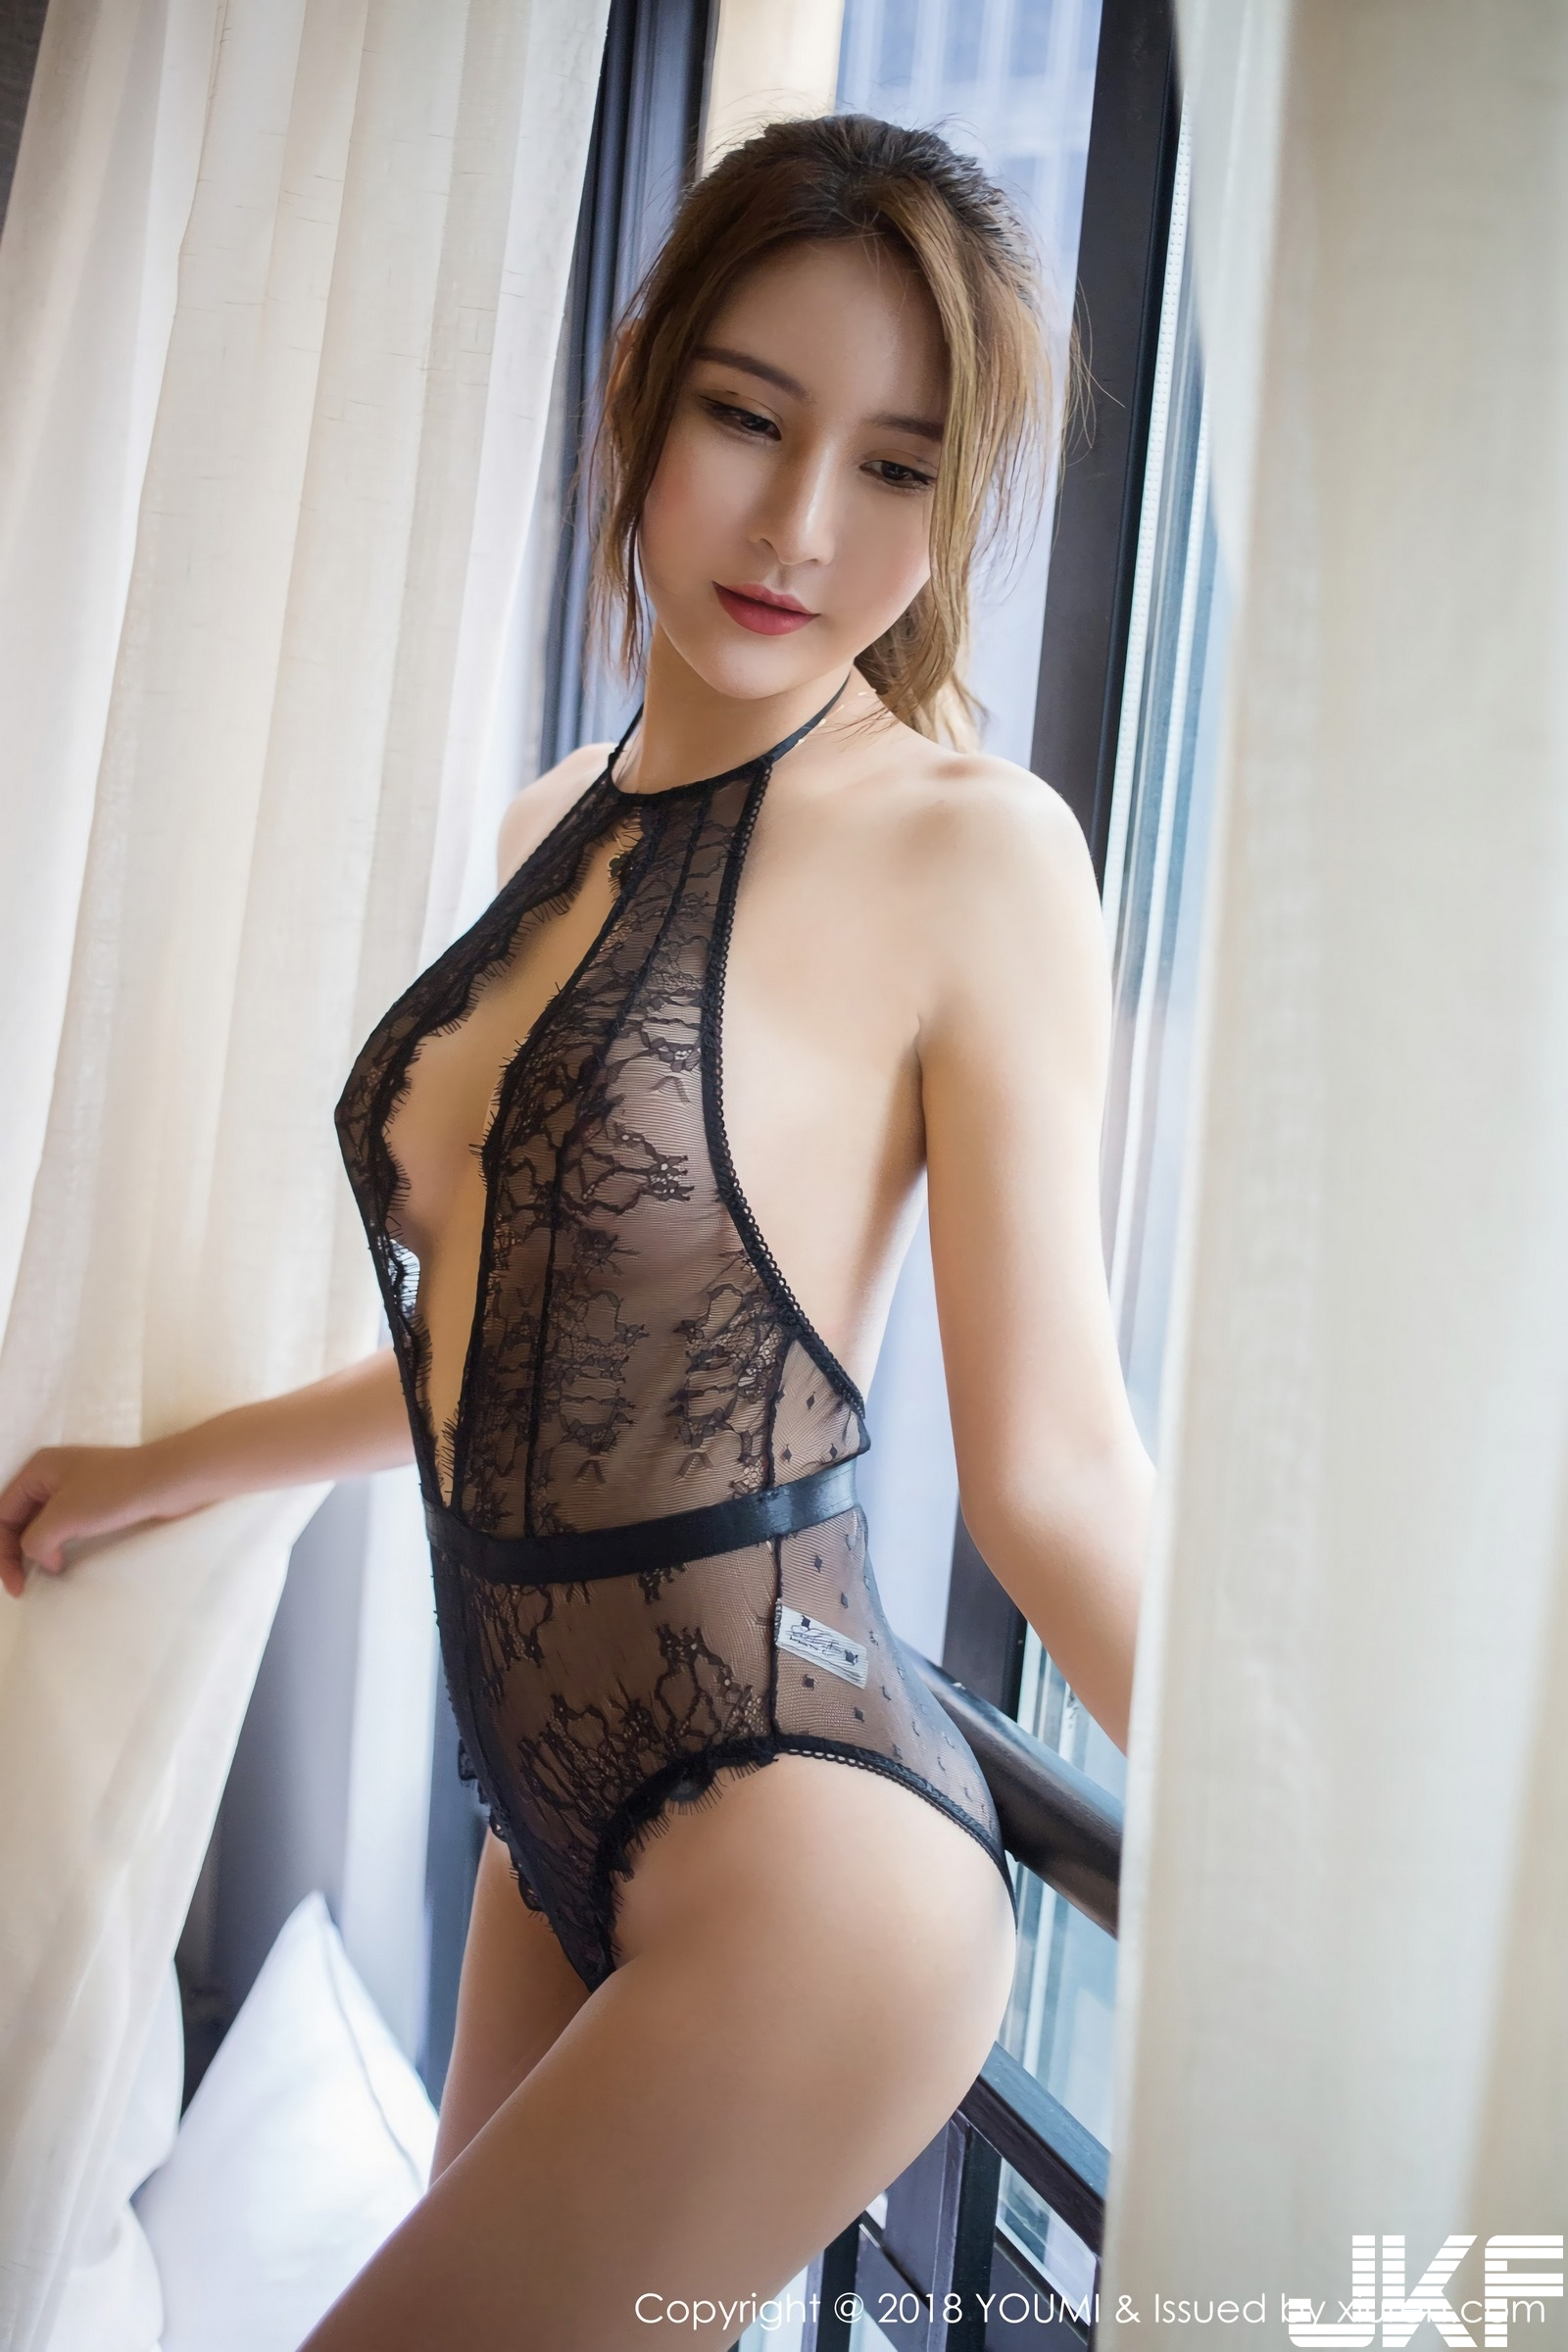 SOLO-尹菲 2018.08.20 尤蜜荟VOL.202 - 貼圖 - 清涼寫真 -